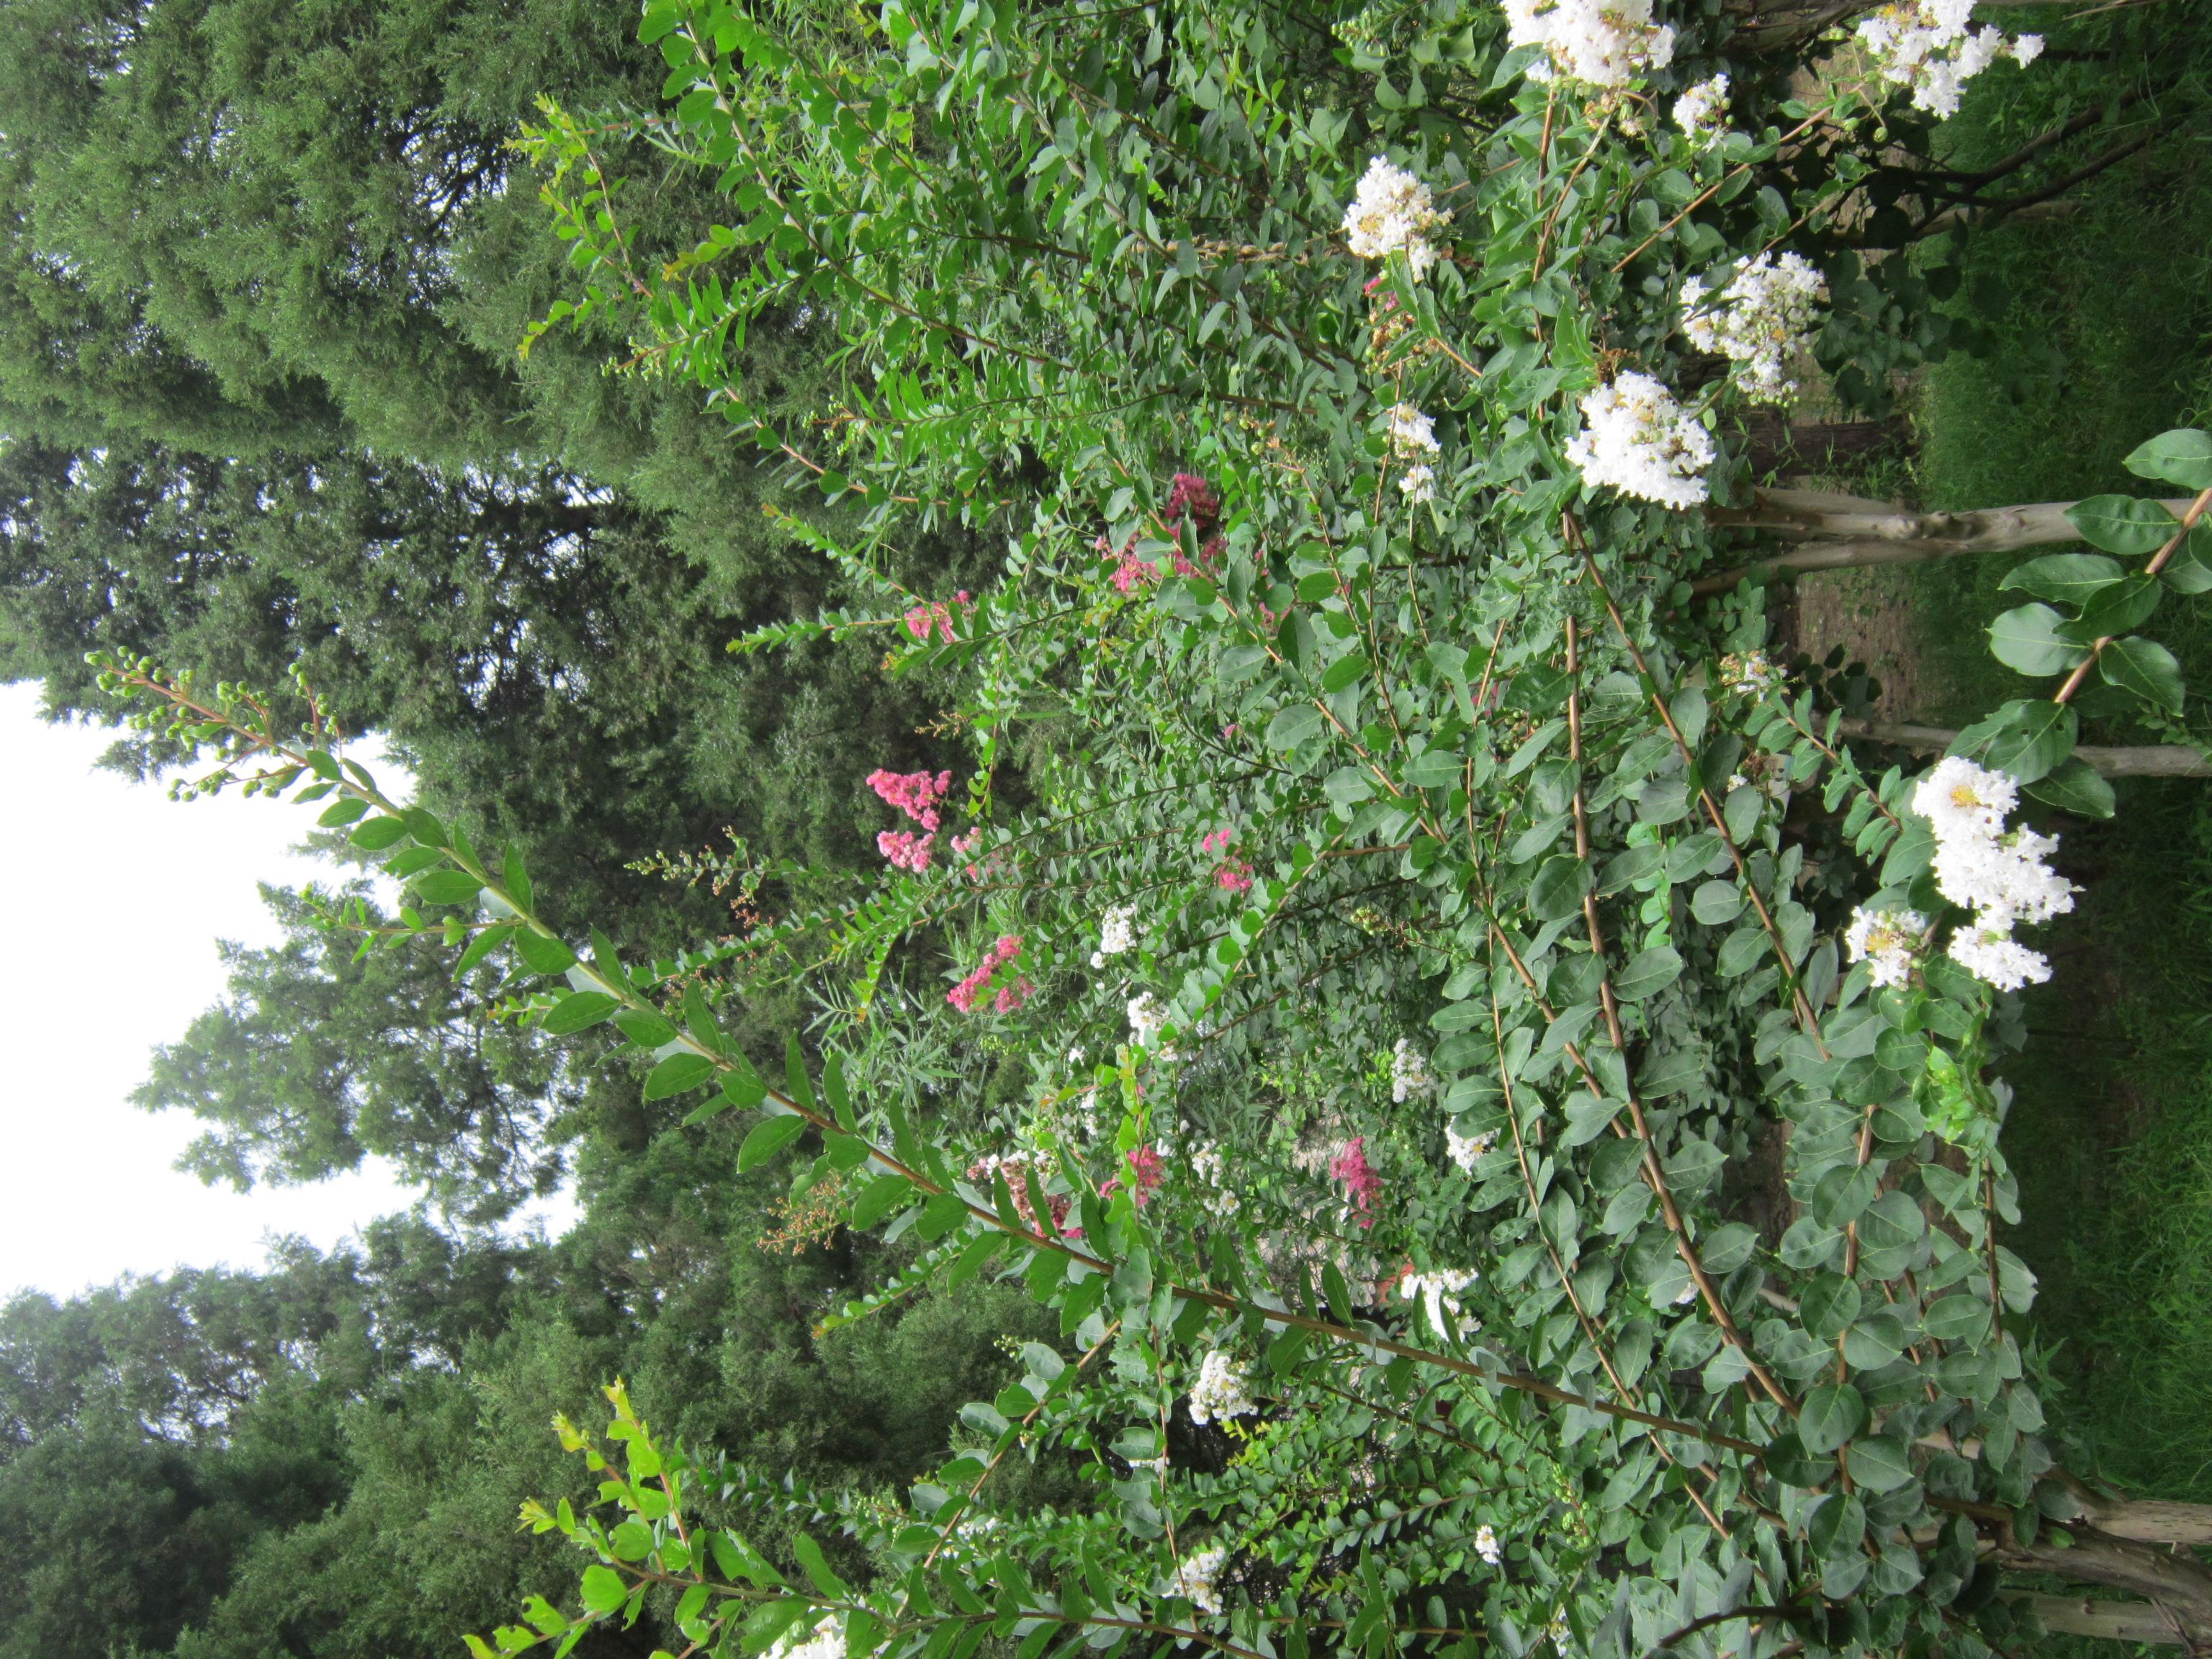 Beijing China rondreis groen park gezond Jingshan Park